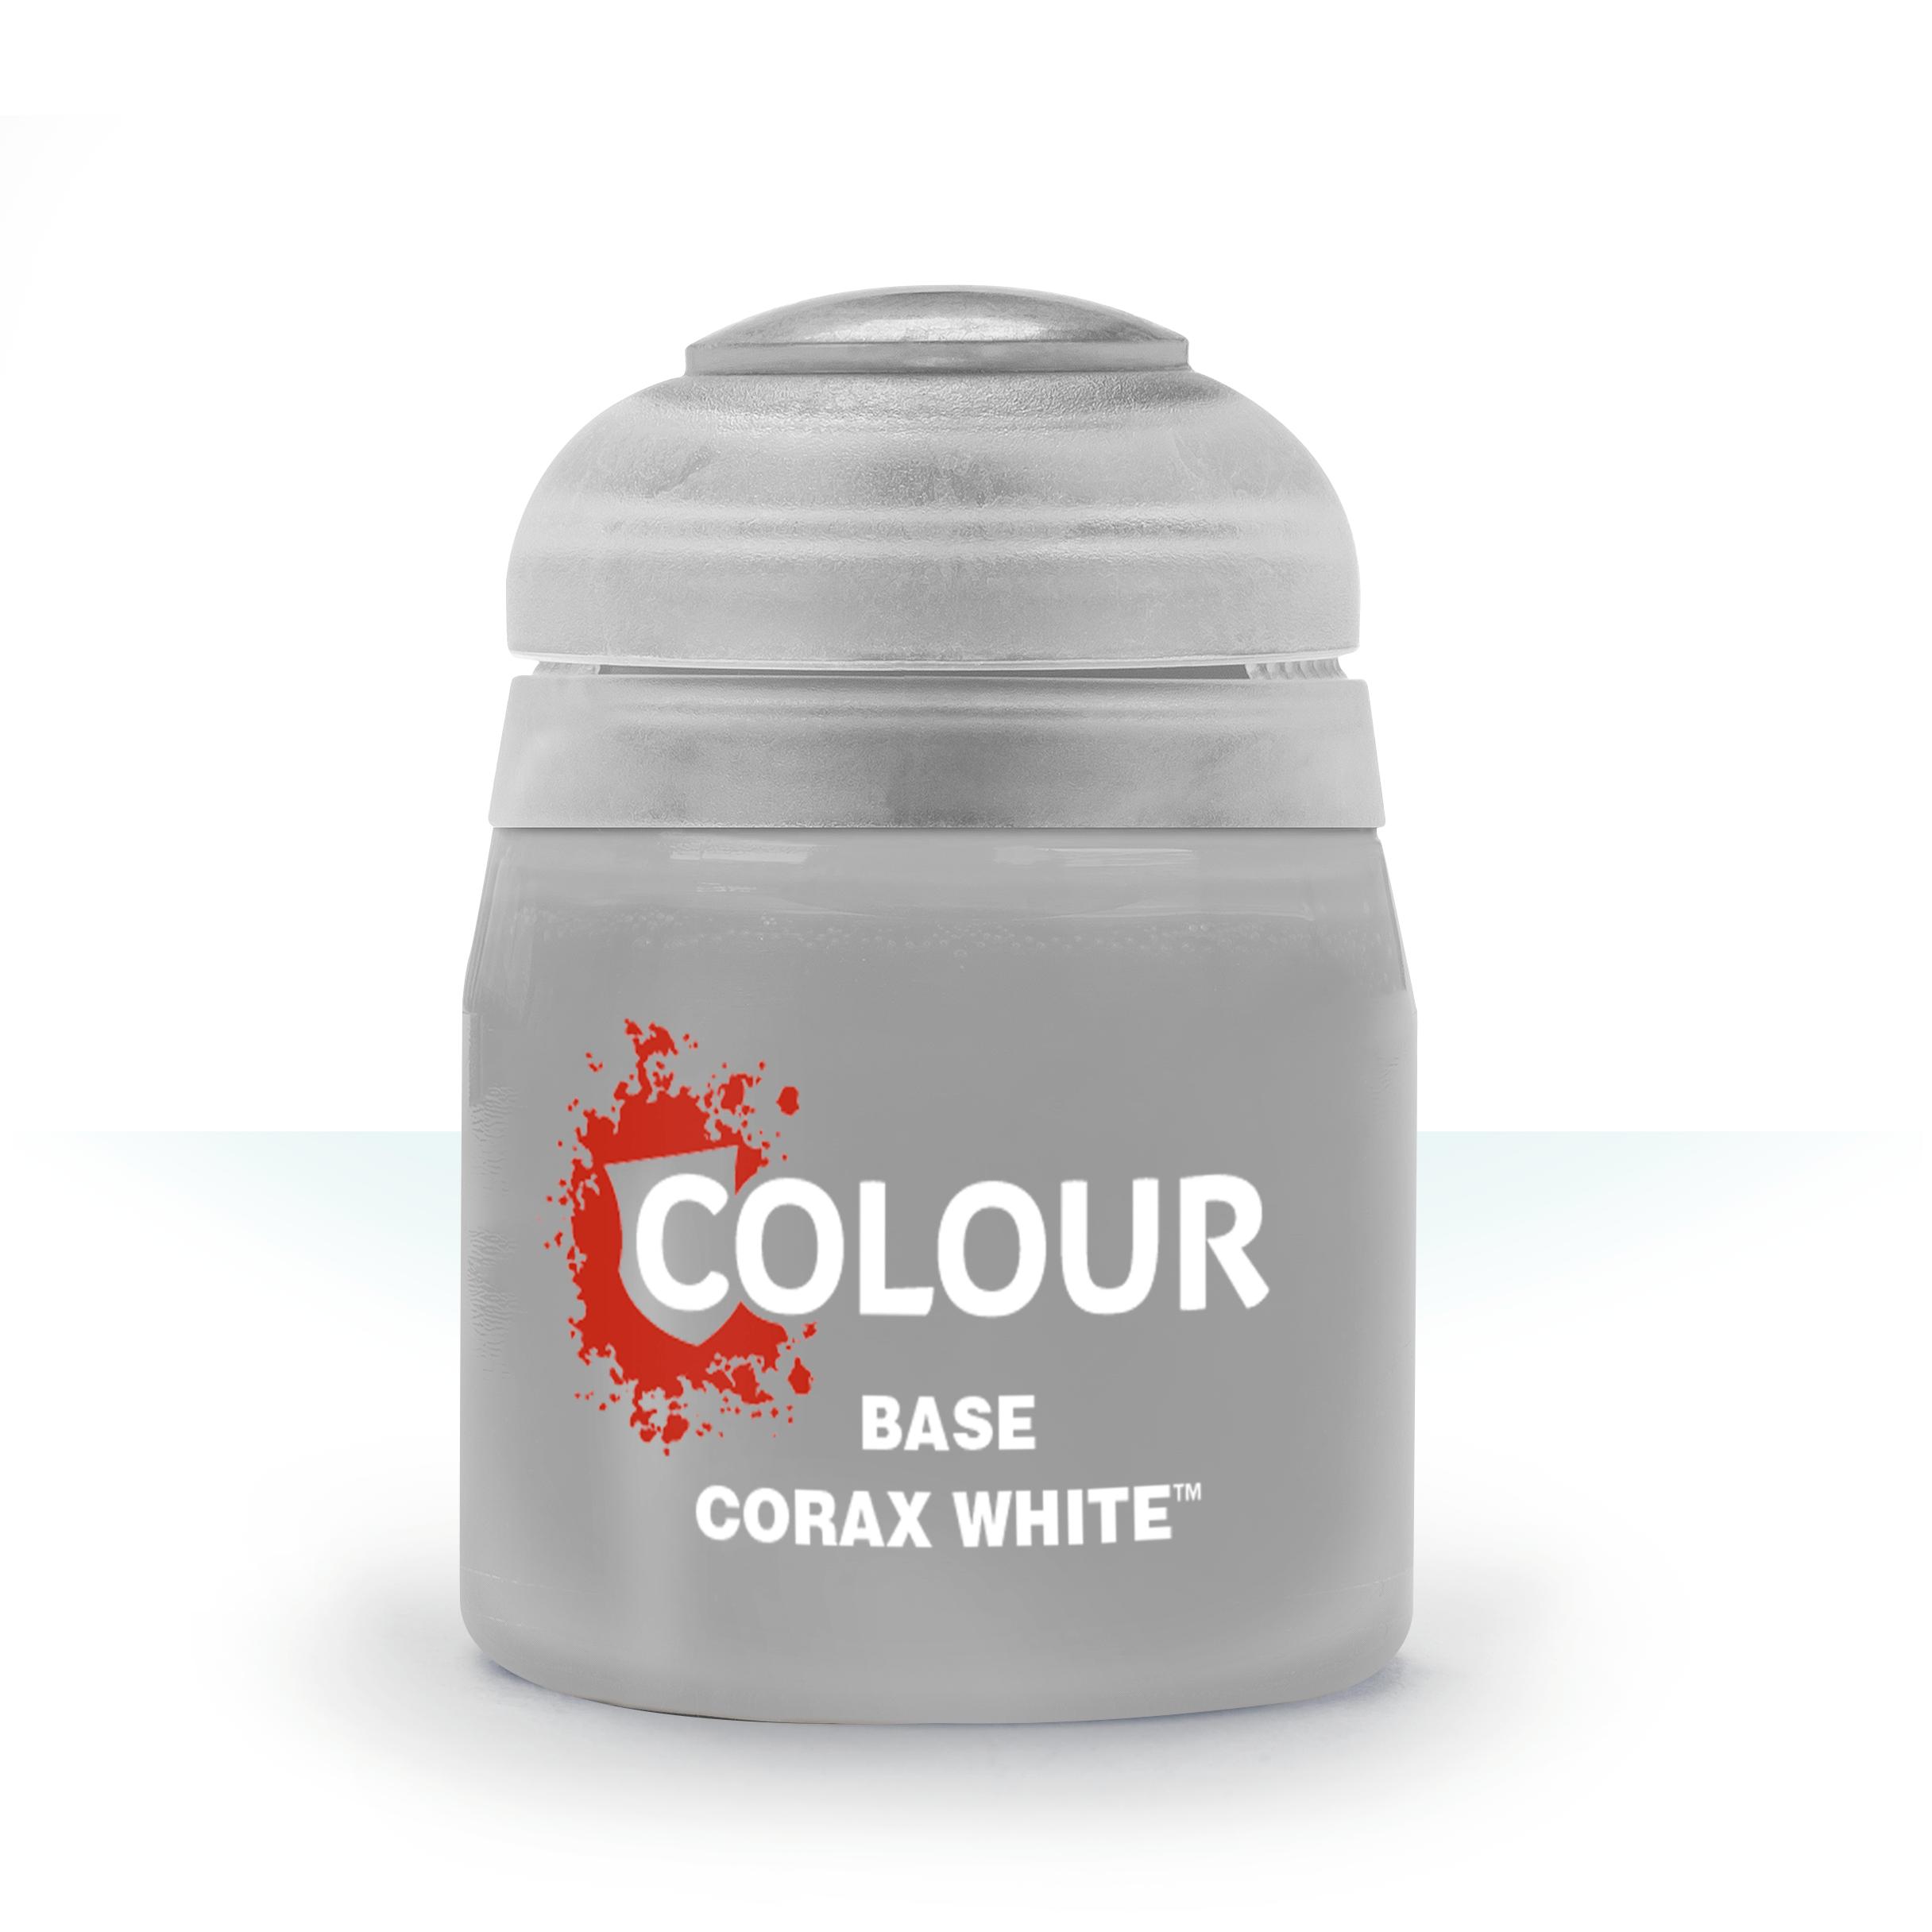 Corax White, Citadel Base 12ml